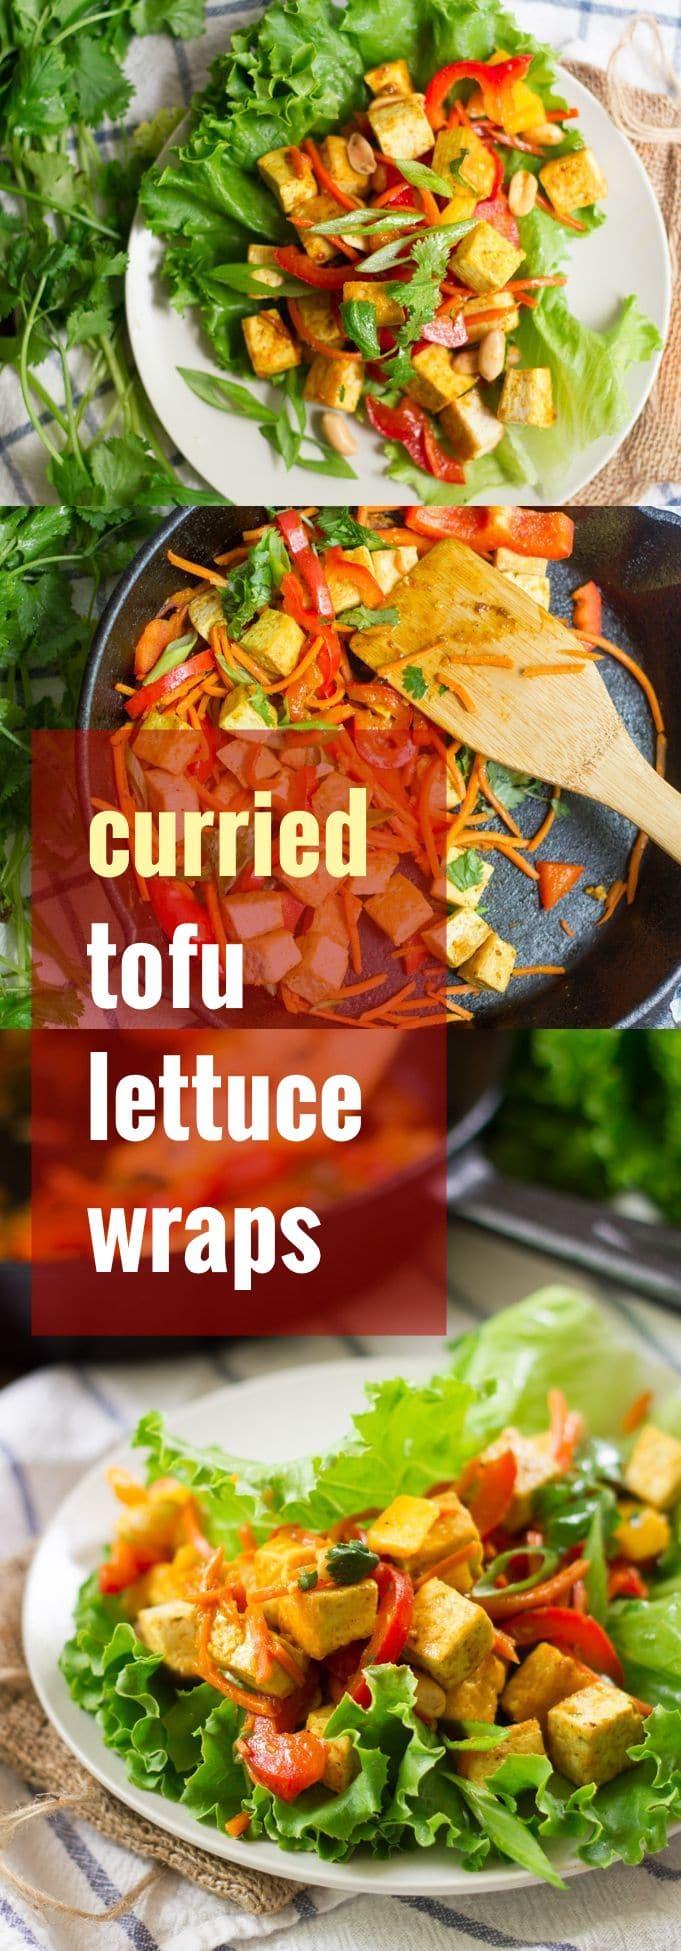 Stir-Fried Veggie & Curried Tofu Lettuce Wraps